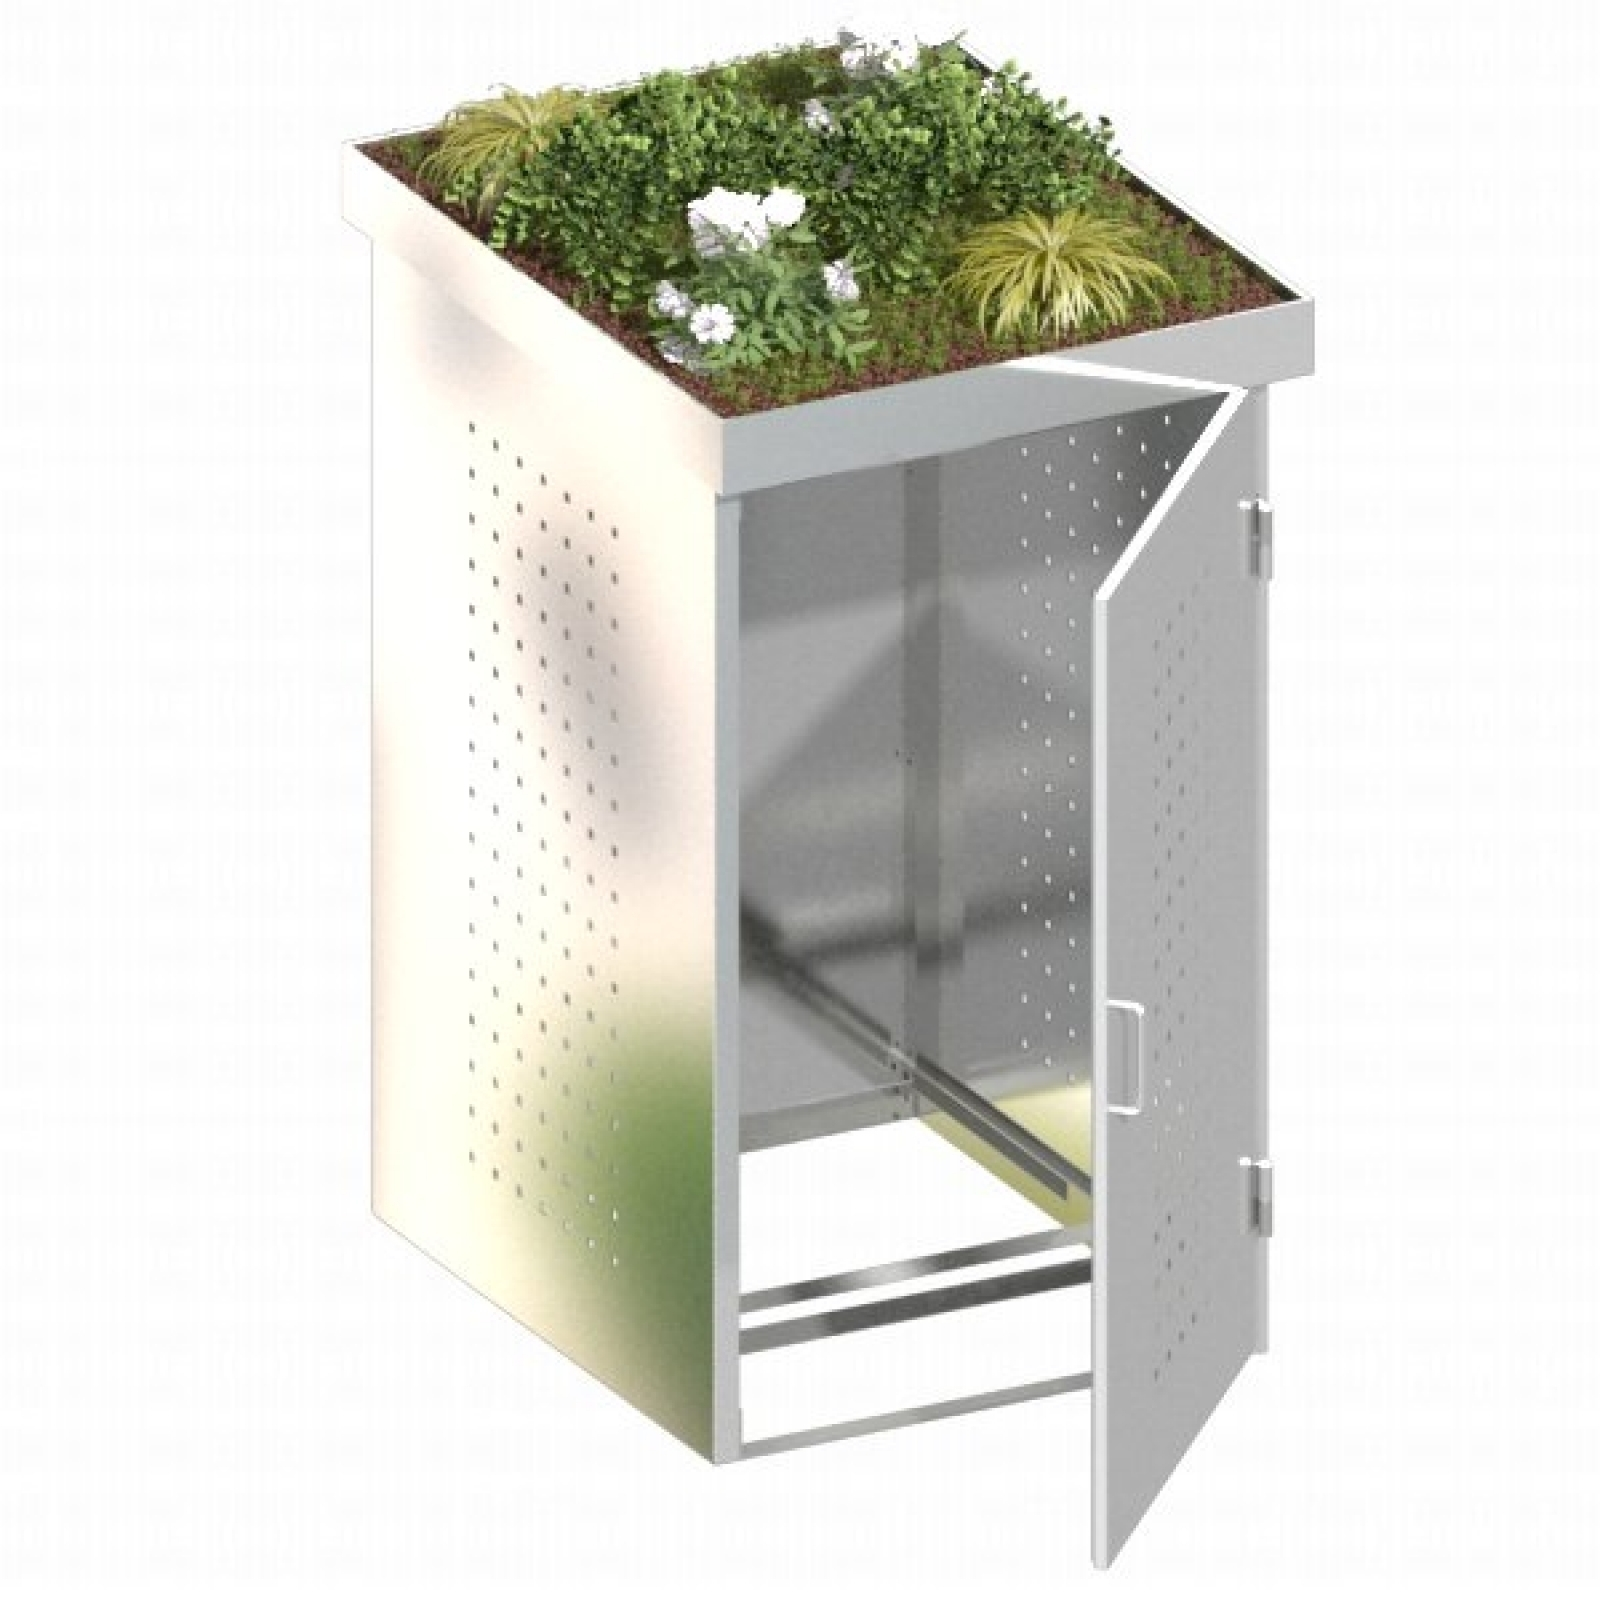 binto m lltonnenbox edelstahl system 1p. Black Bedroom Furniture Sets. Home Design Ideas